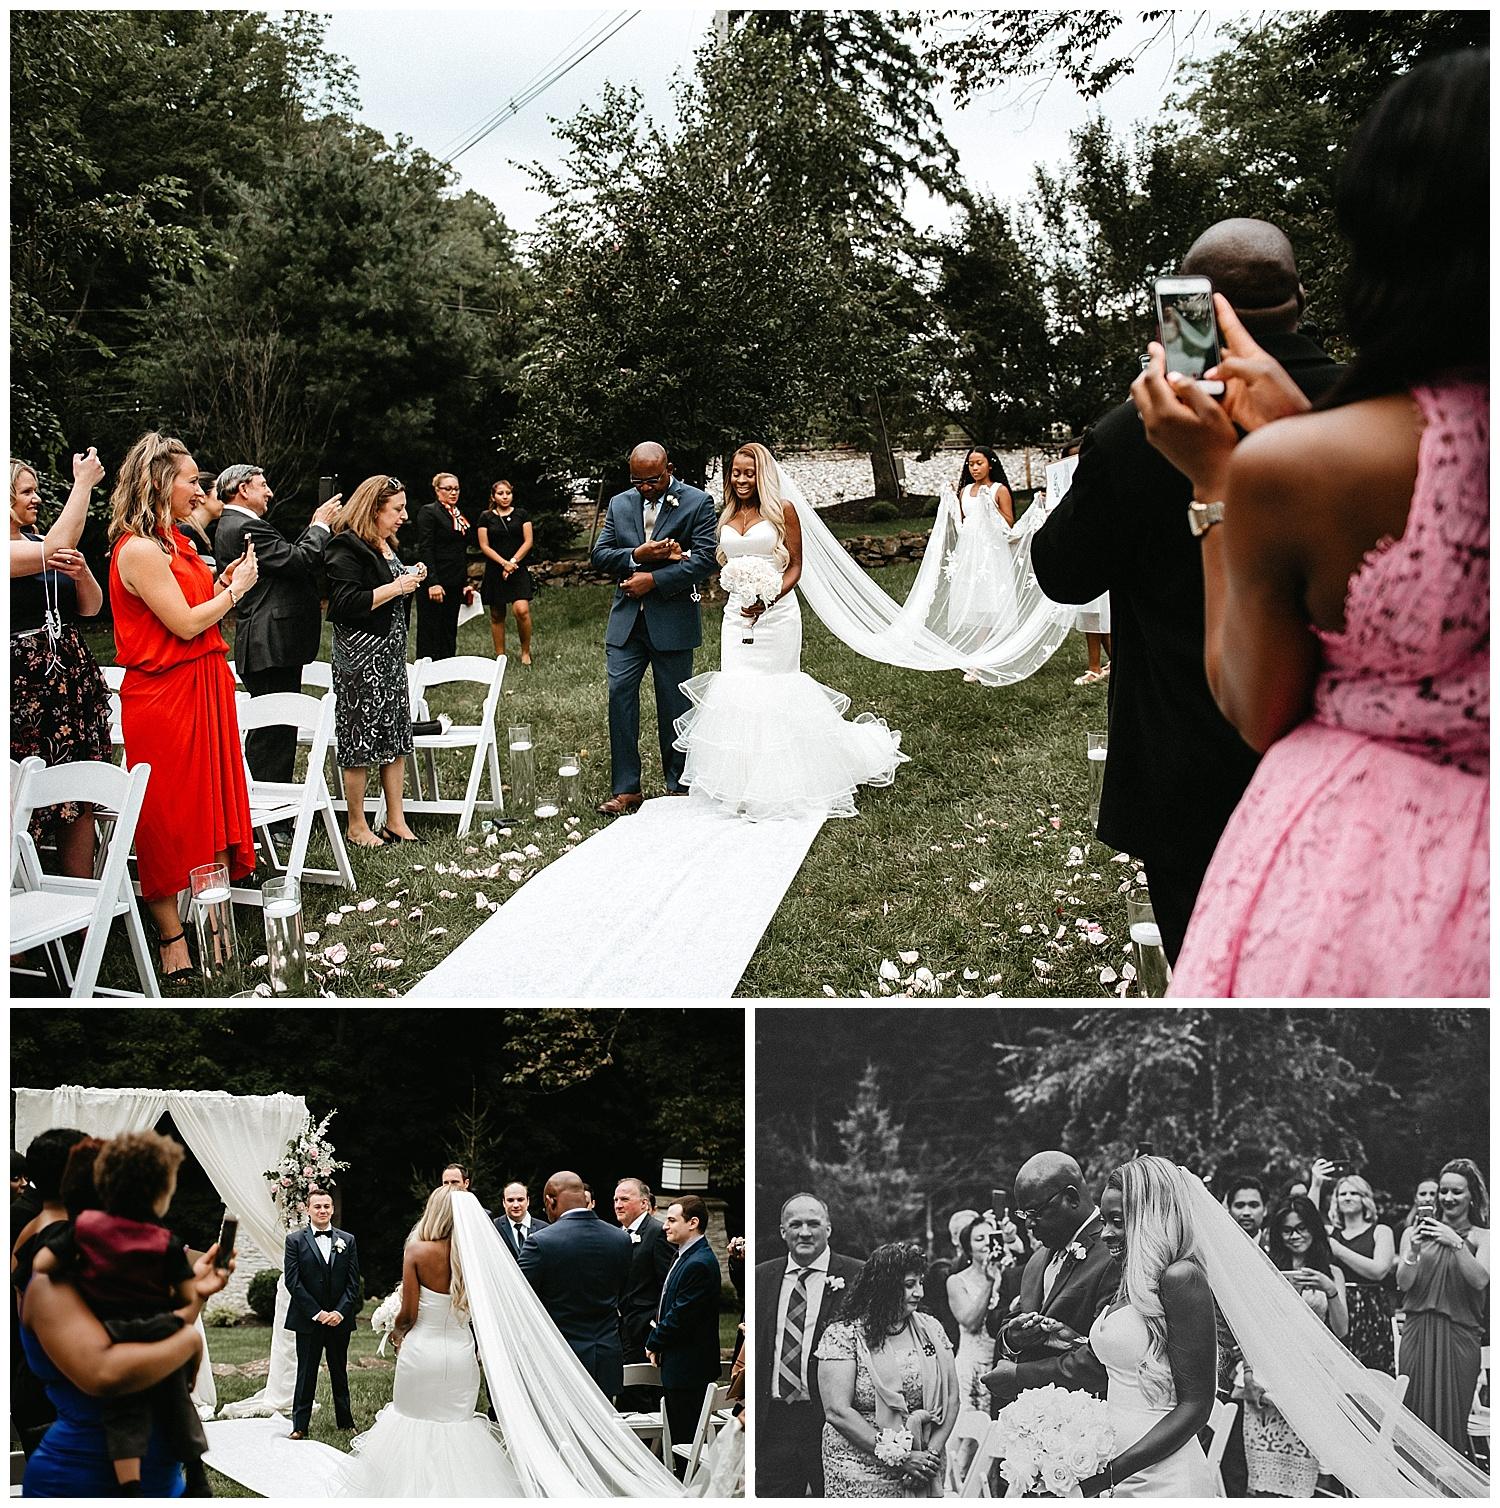 New-Jersey-wedding-photographer-at-Stone-House-at-stirling-ridge-Warren-NJ_0044.jpg